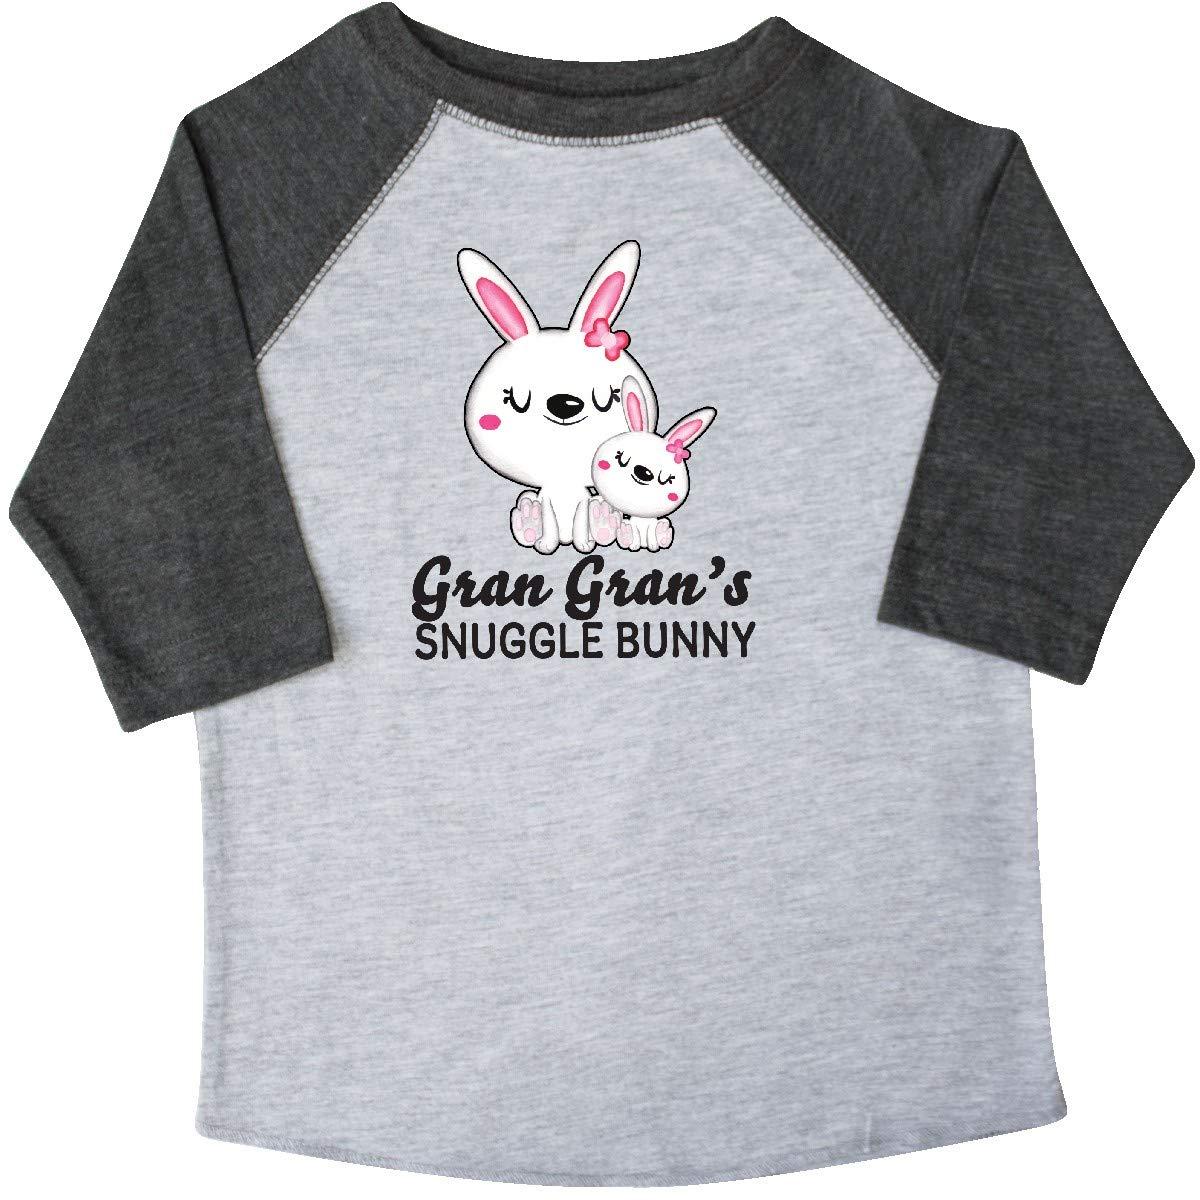 inktastic Gran Grans Snuggle Bunny Easter Toddler T-Shirt